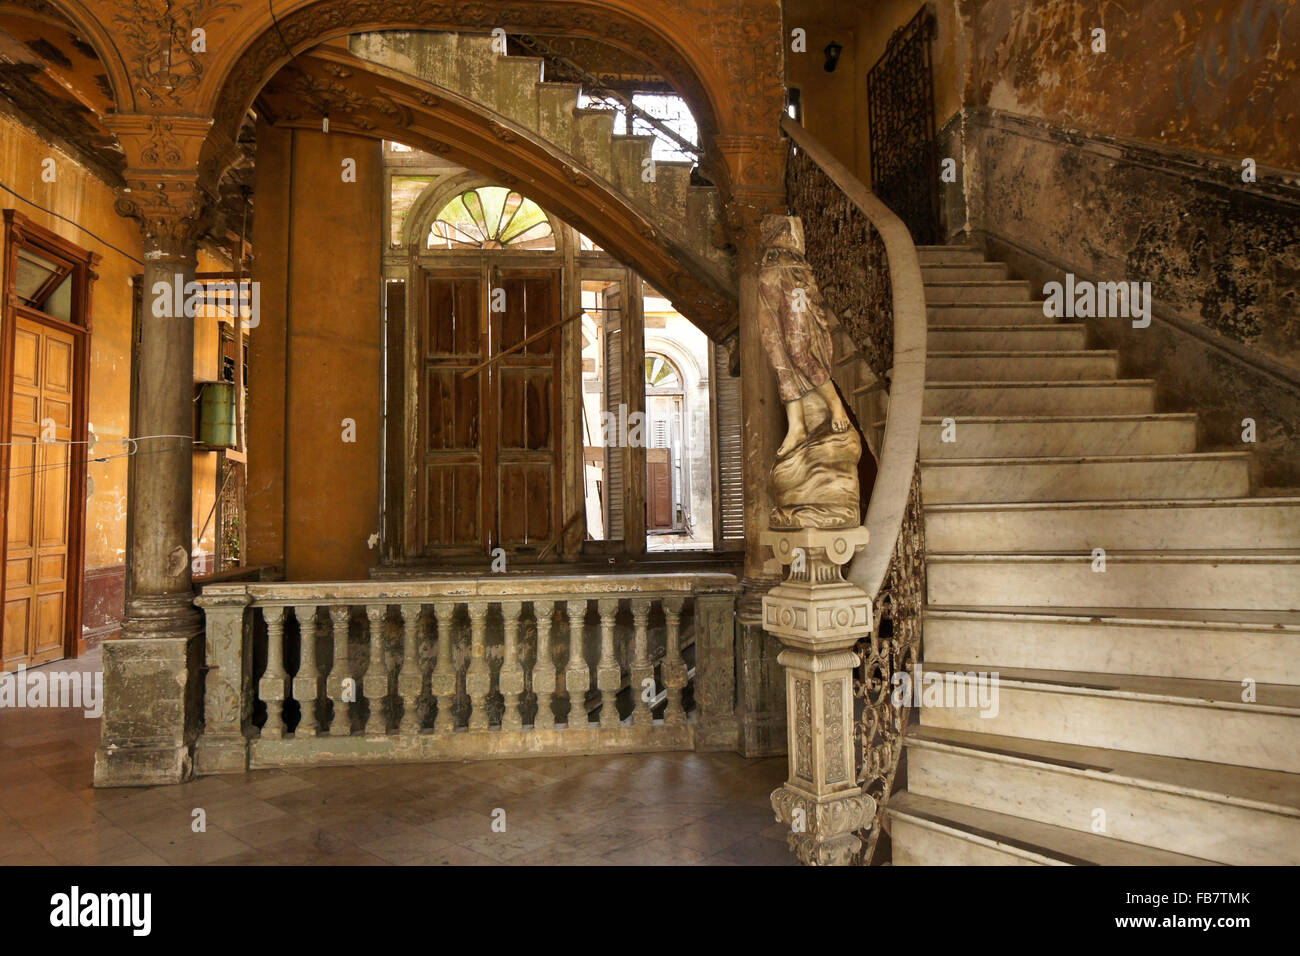 Marble staircase and statue in La Mansion Camaguey (La Guarida building), Havana, Cuba - Stock Image